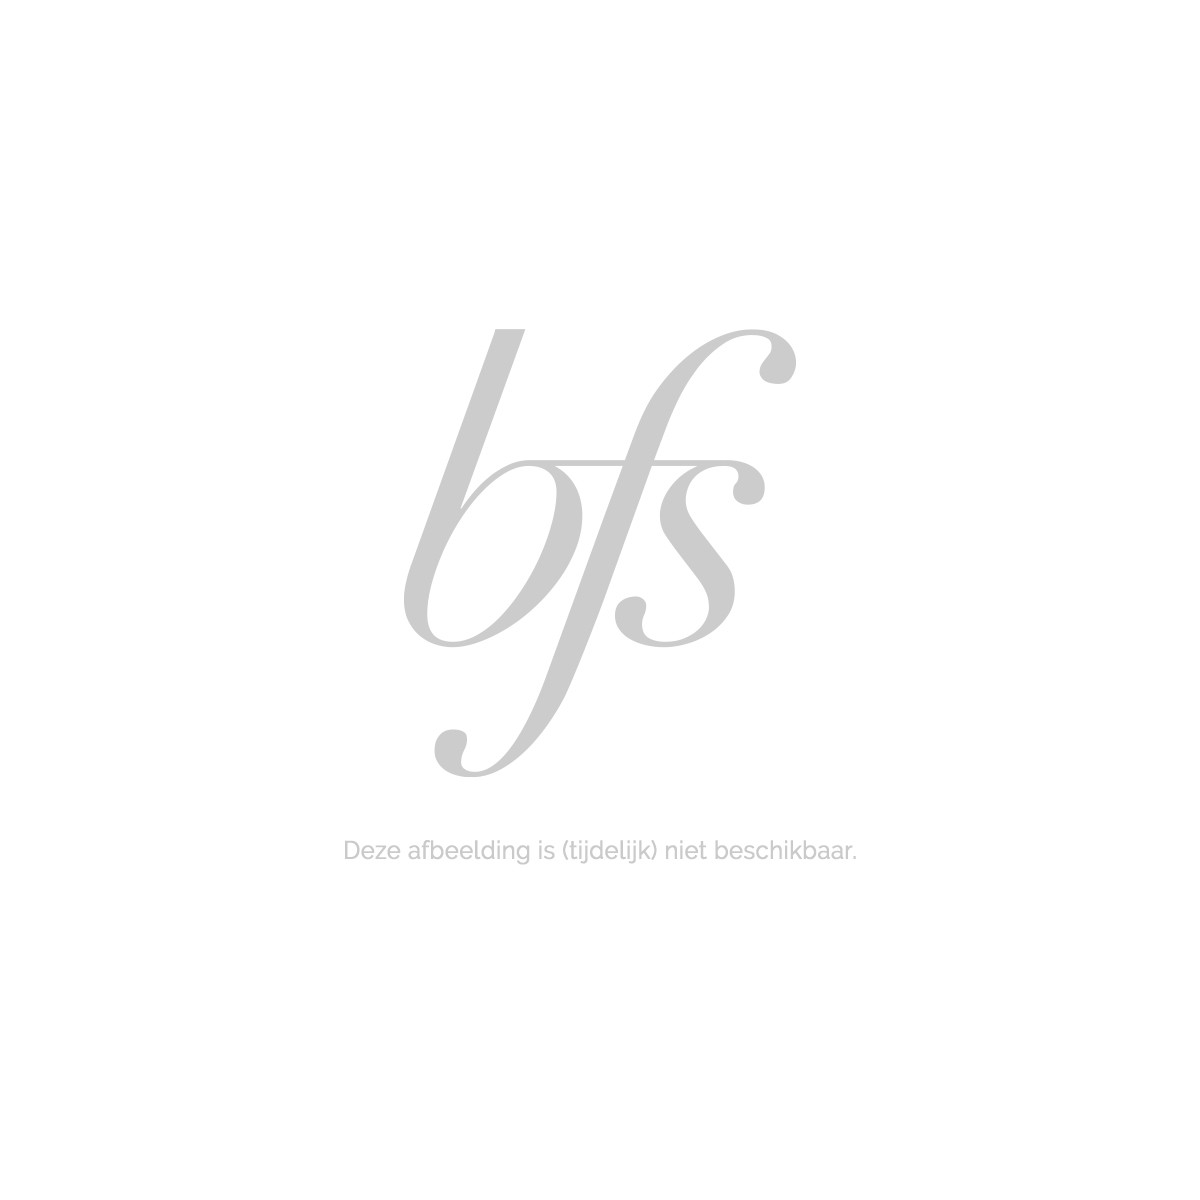 Givenchy Very Irresistible For Women Eau De Toilette Spray 30 Ml